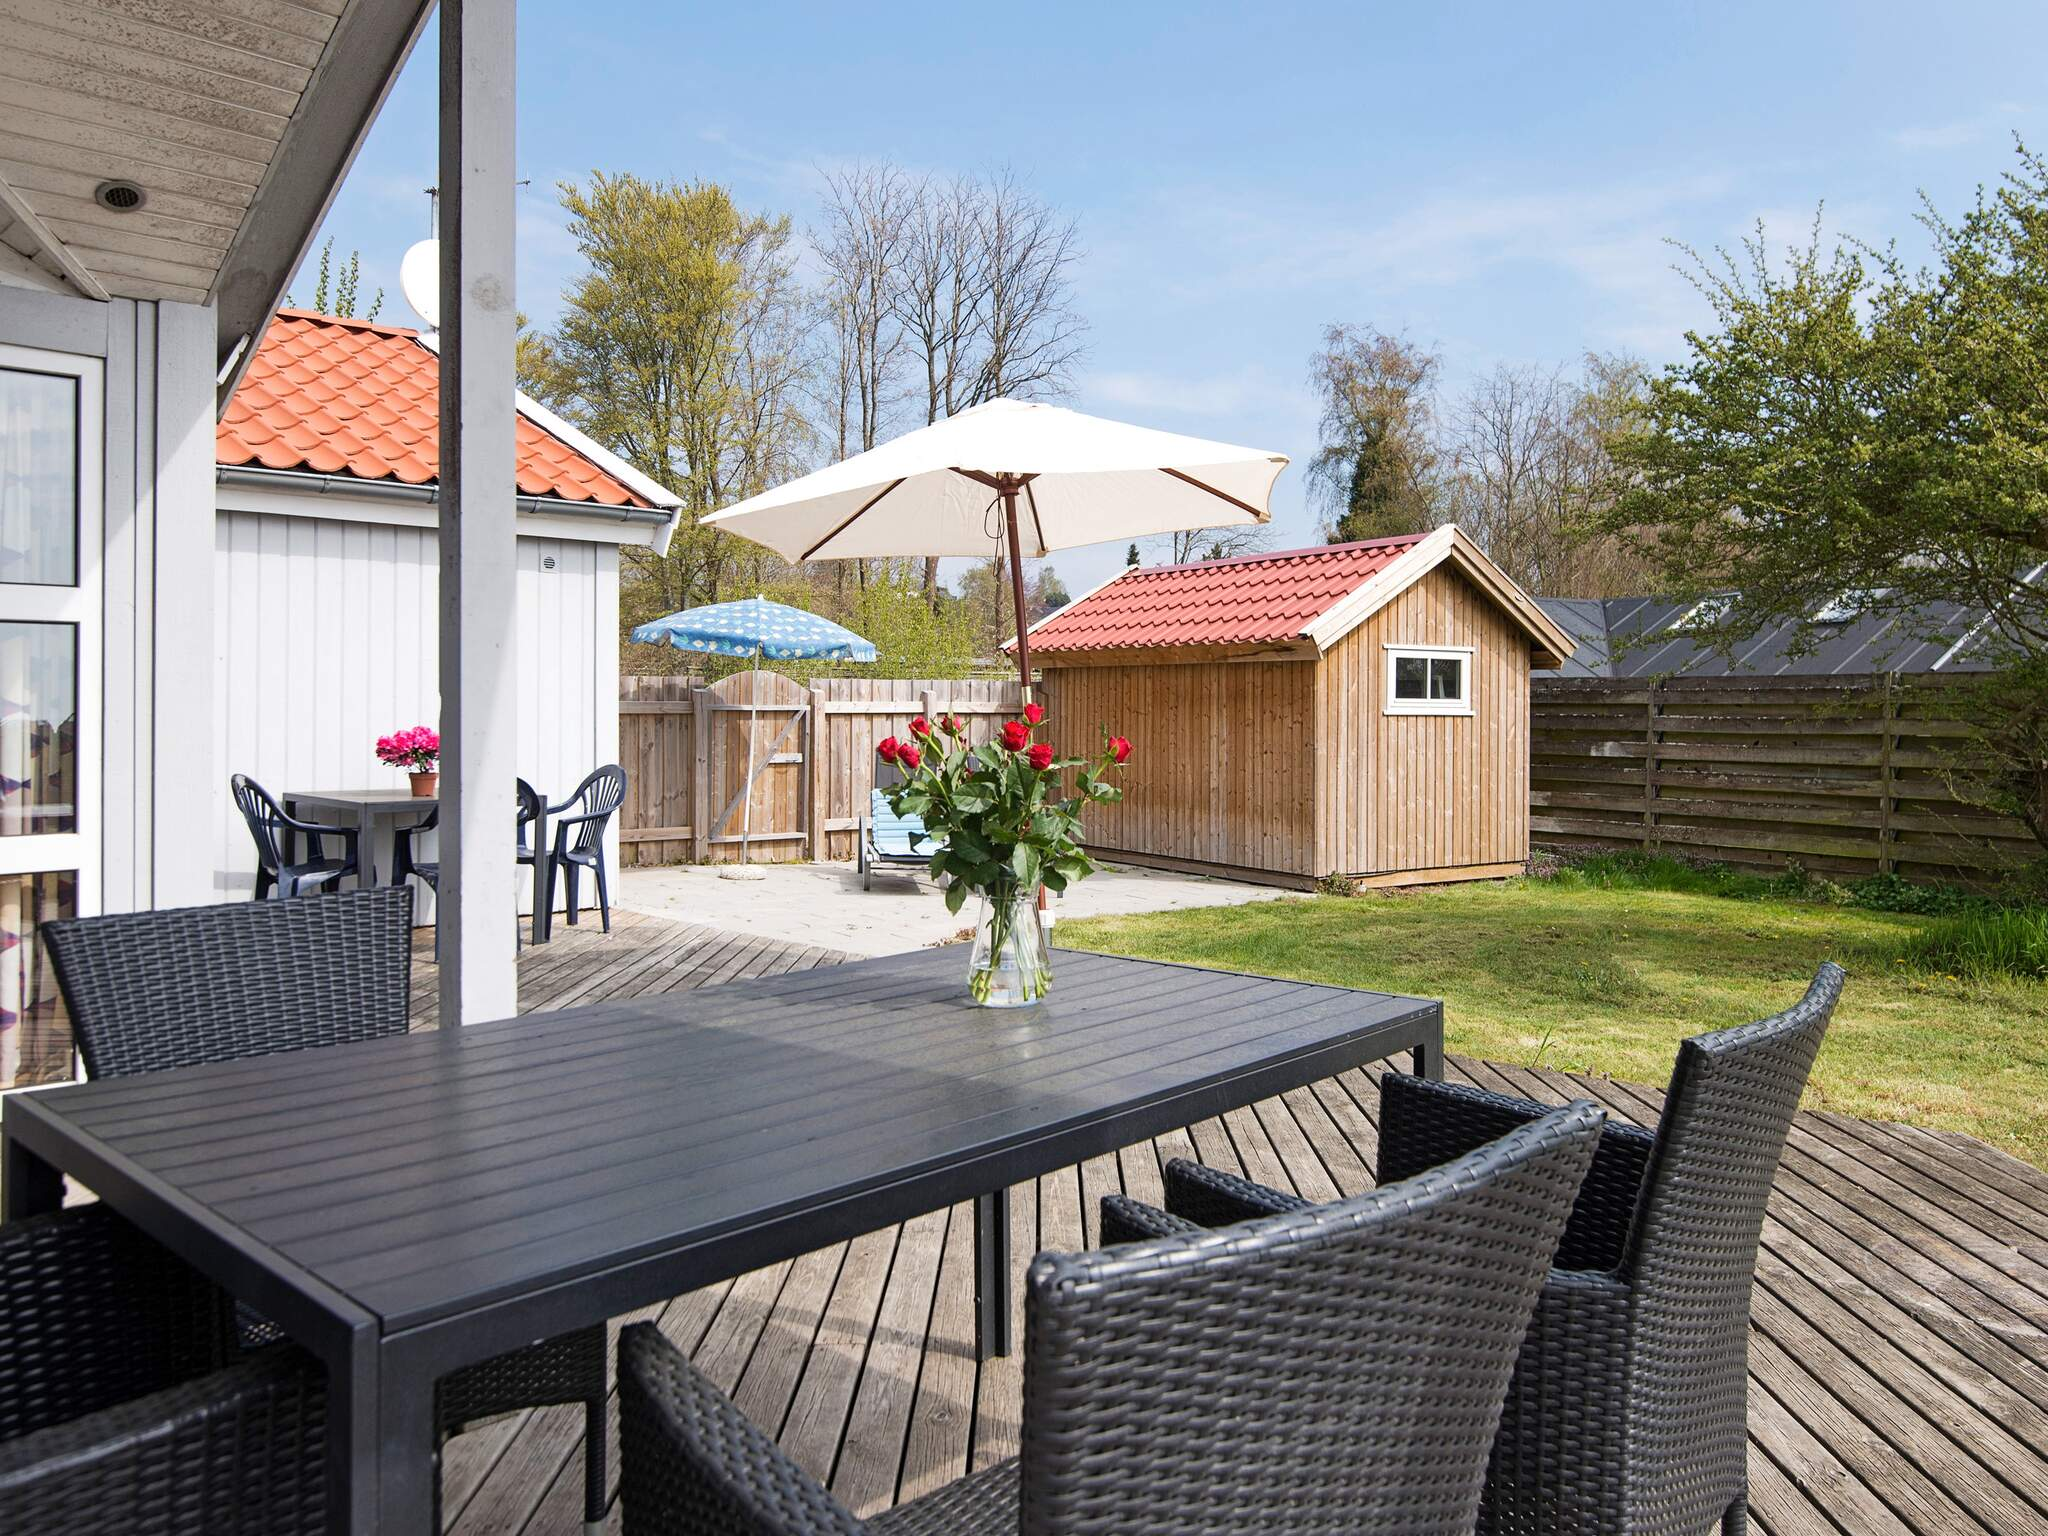 Ferienhaus Lyngsbæk Strand (493391), Ebeltoft, , Ostjütland, Dänemark, Bild 22